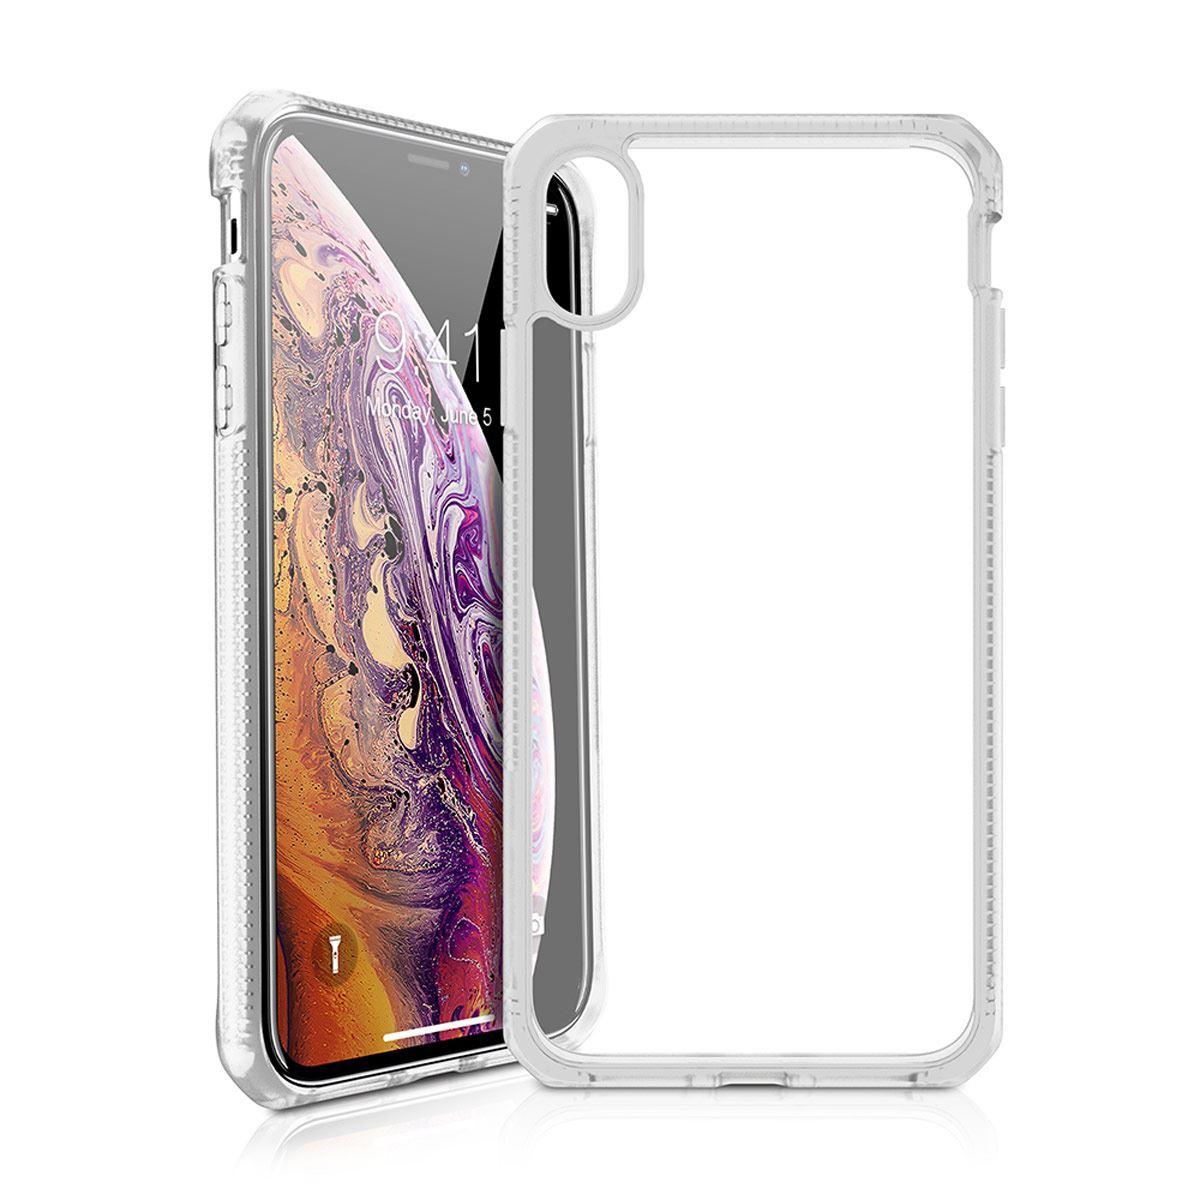 Funda Iphone XS/X Trans Hybrid MKII